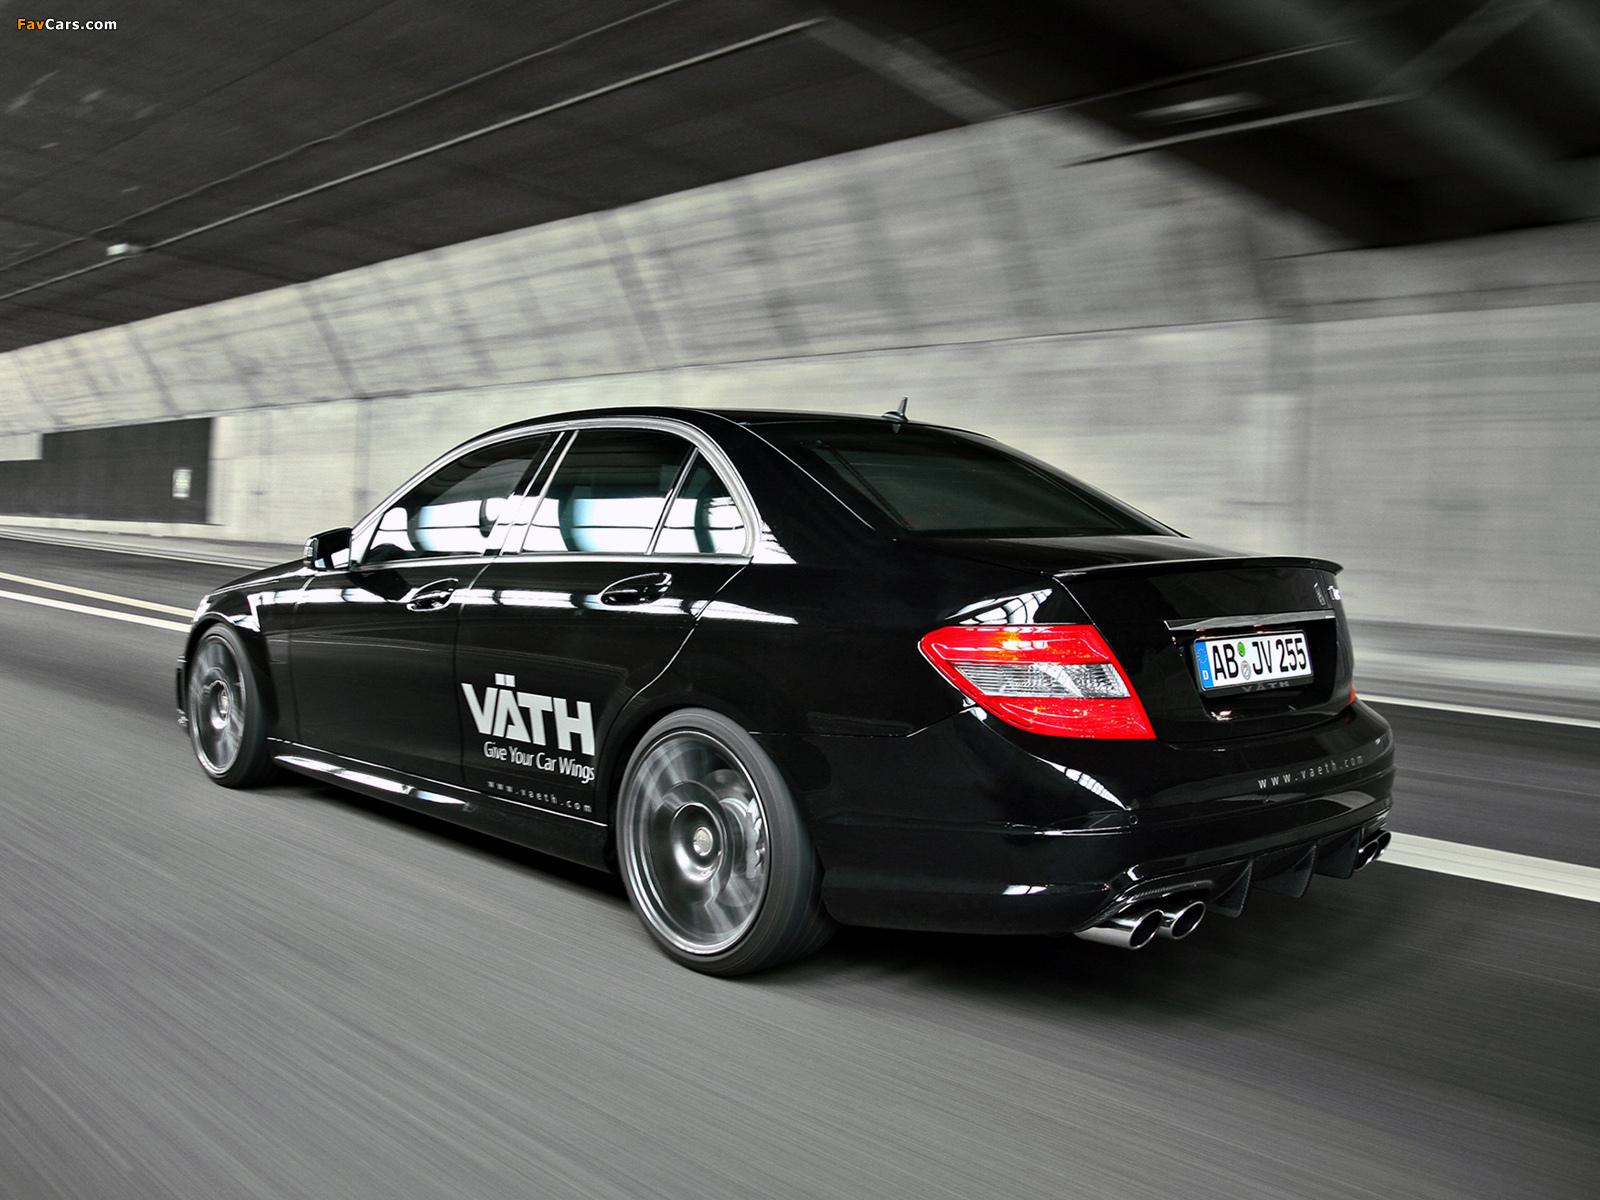 VÄTH Mercedes-Benz C 250 CGI (W204) 2010 wallpapers (1600 x 1200)